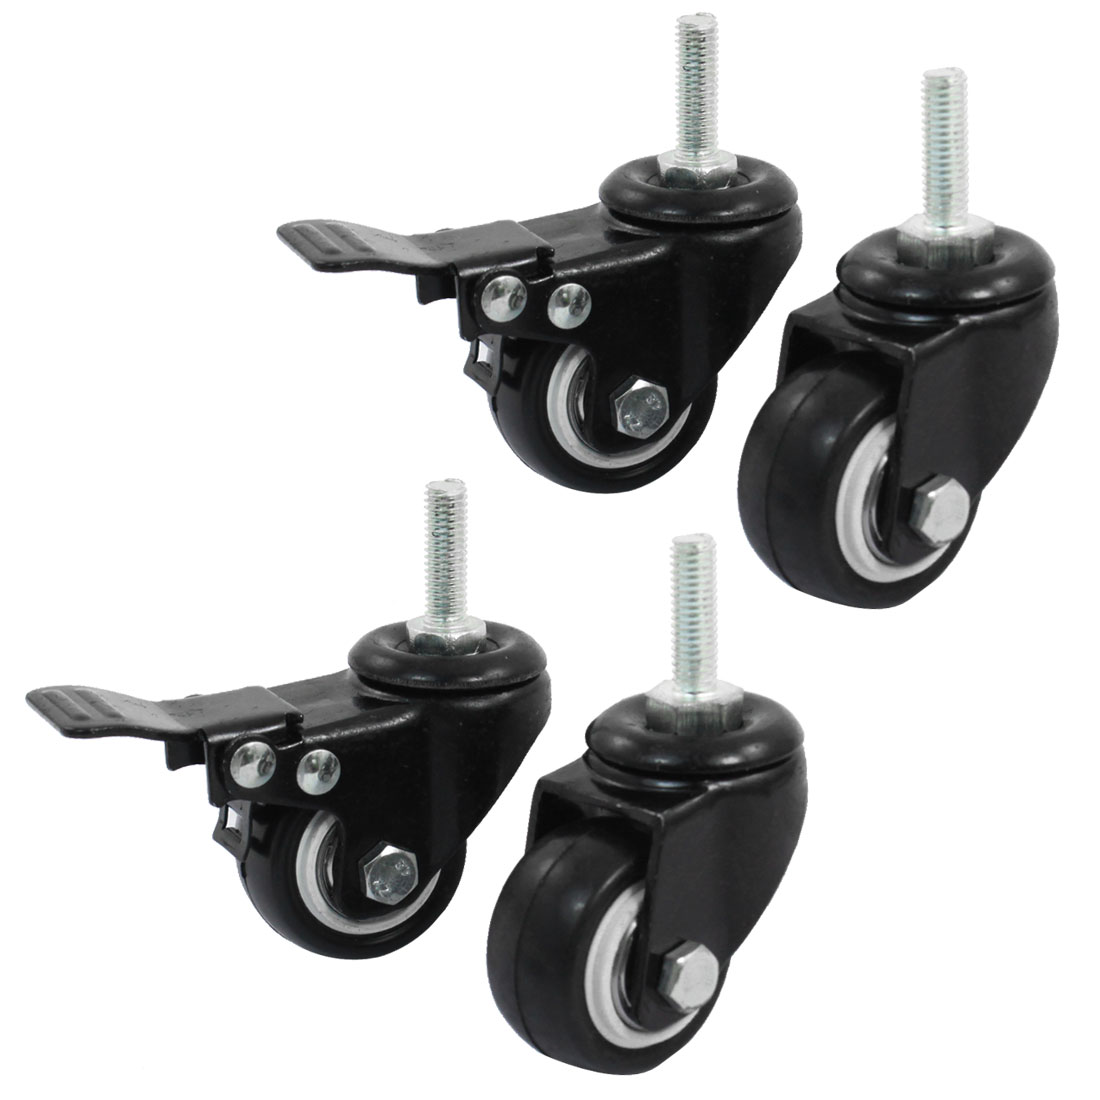 "8mm Thread 1.5"" Wheel Rotatable Shopping Trolley Brake Swivel Caster Black 4pcs"